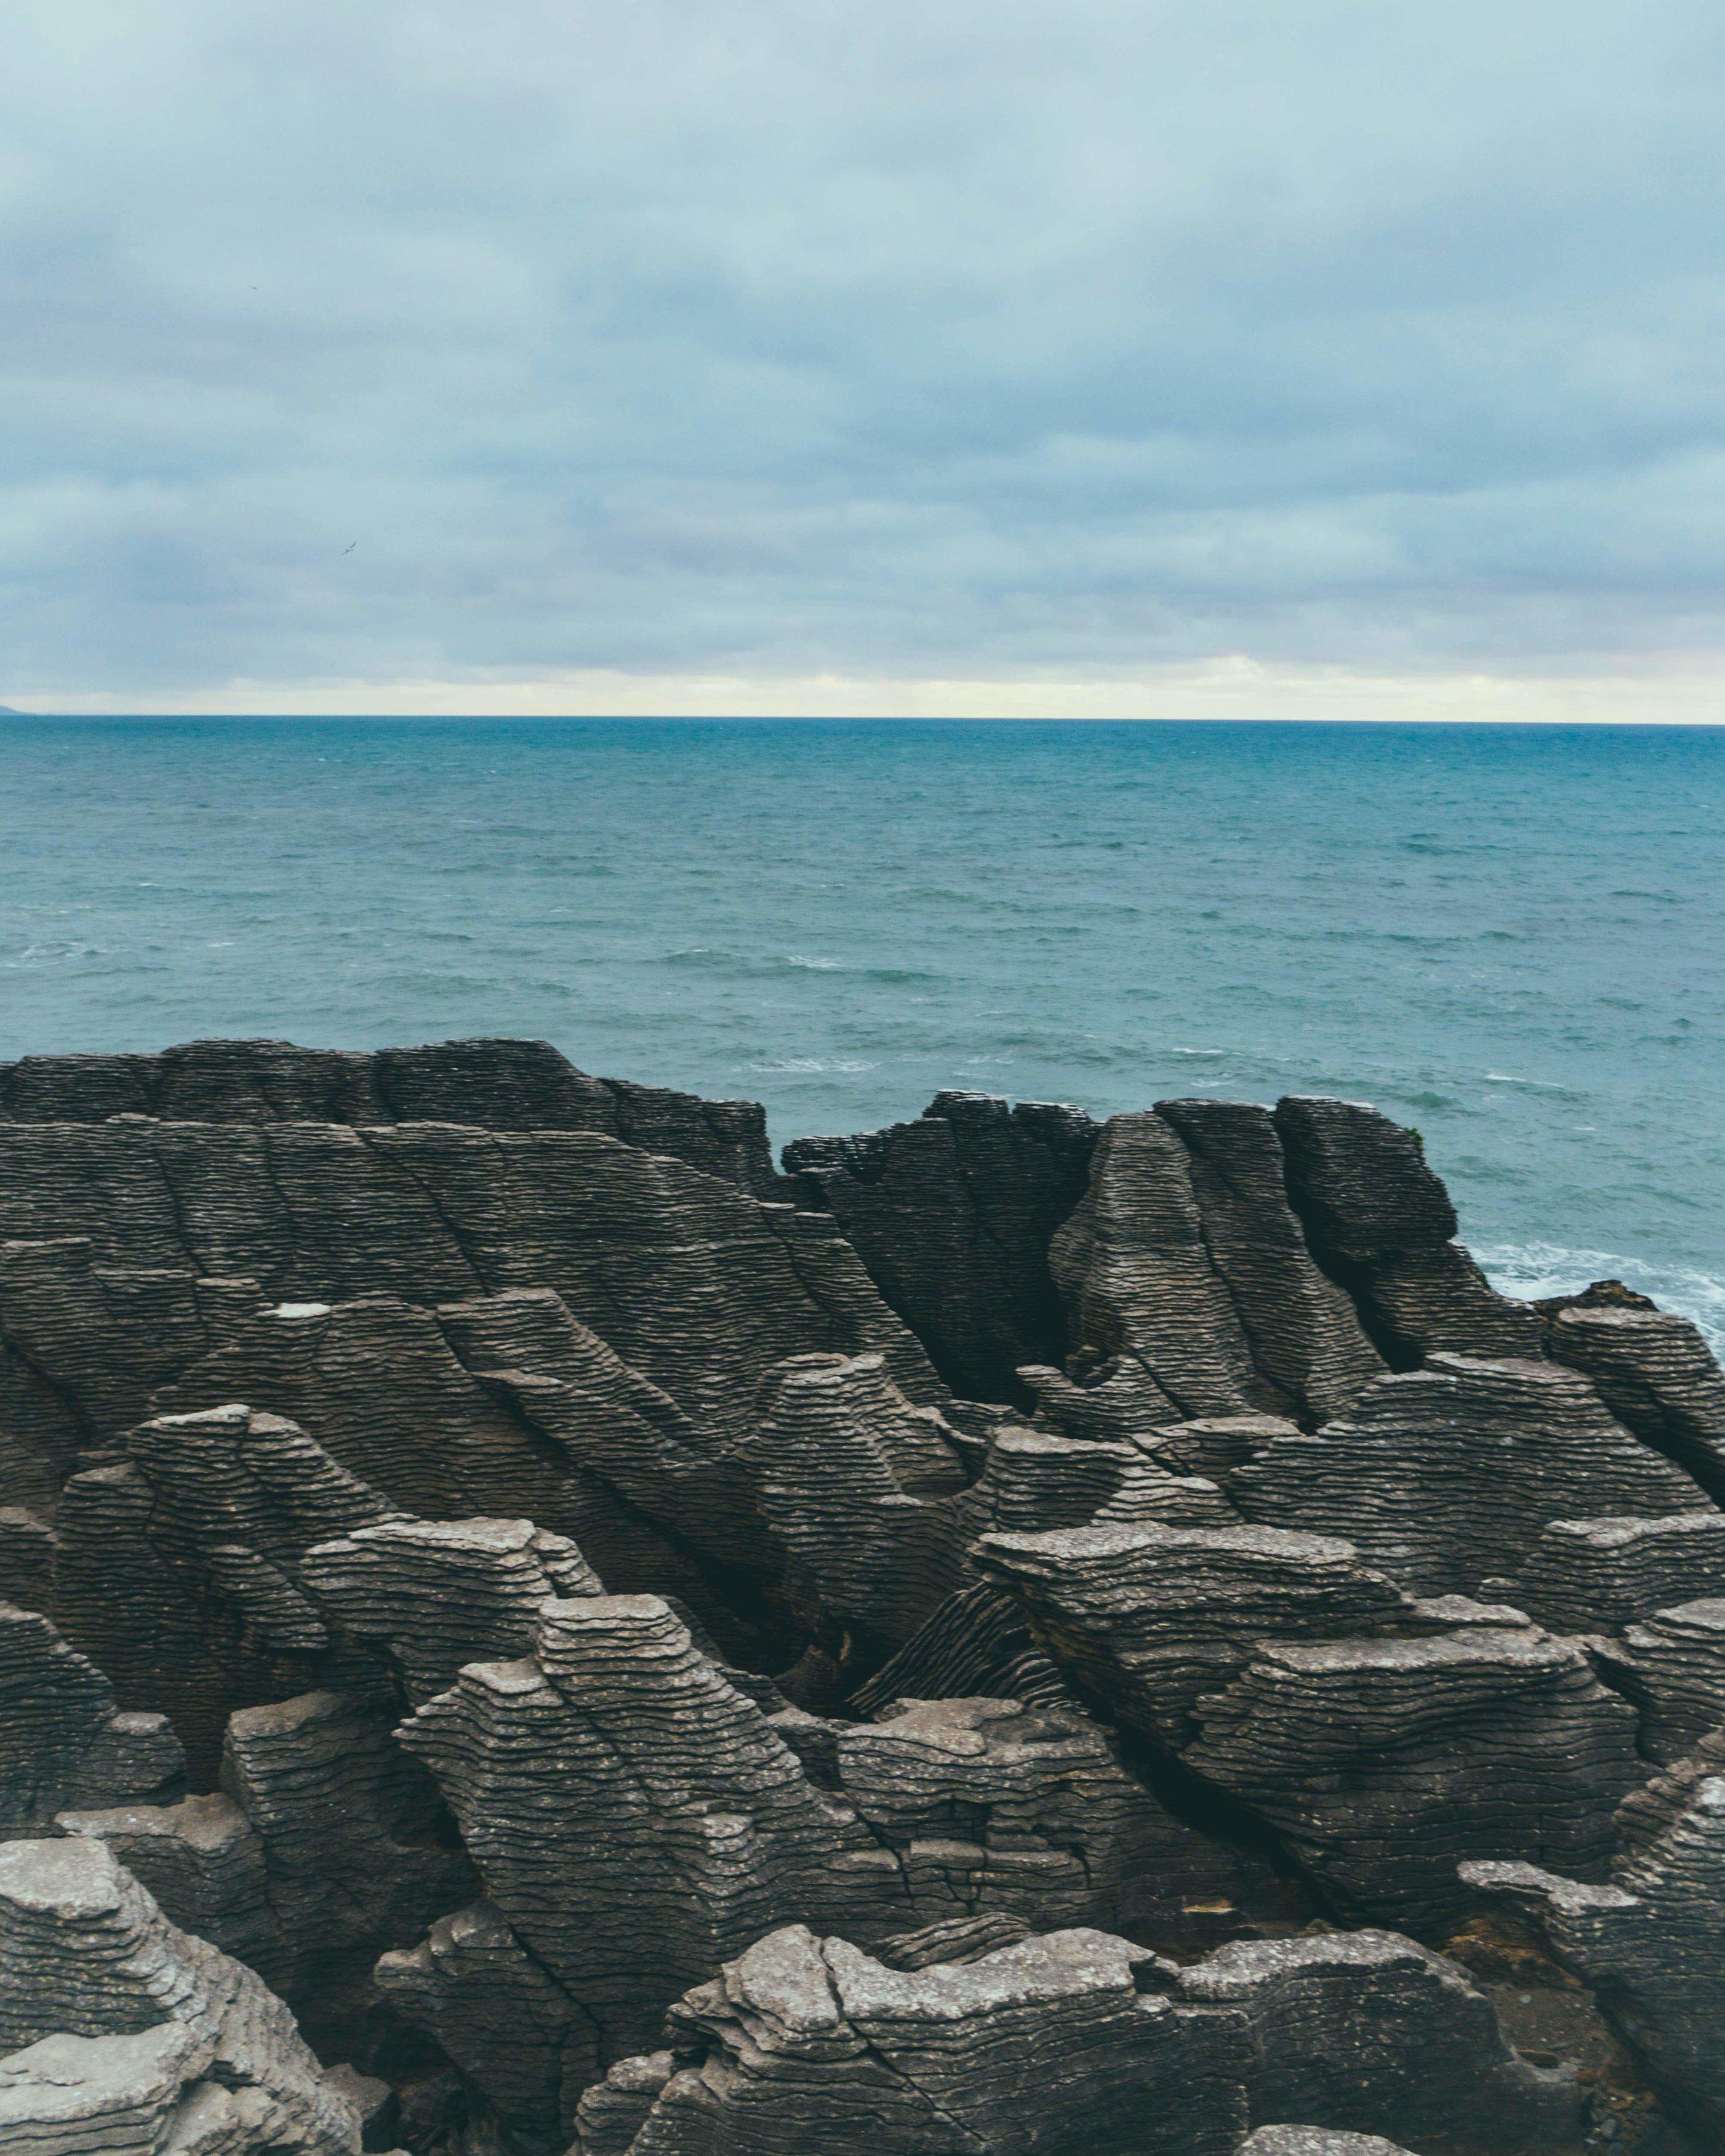 Punakaiki Pancake Rocks and Blowholes, South Island, New Zealand